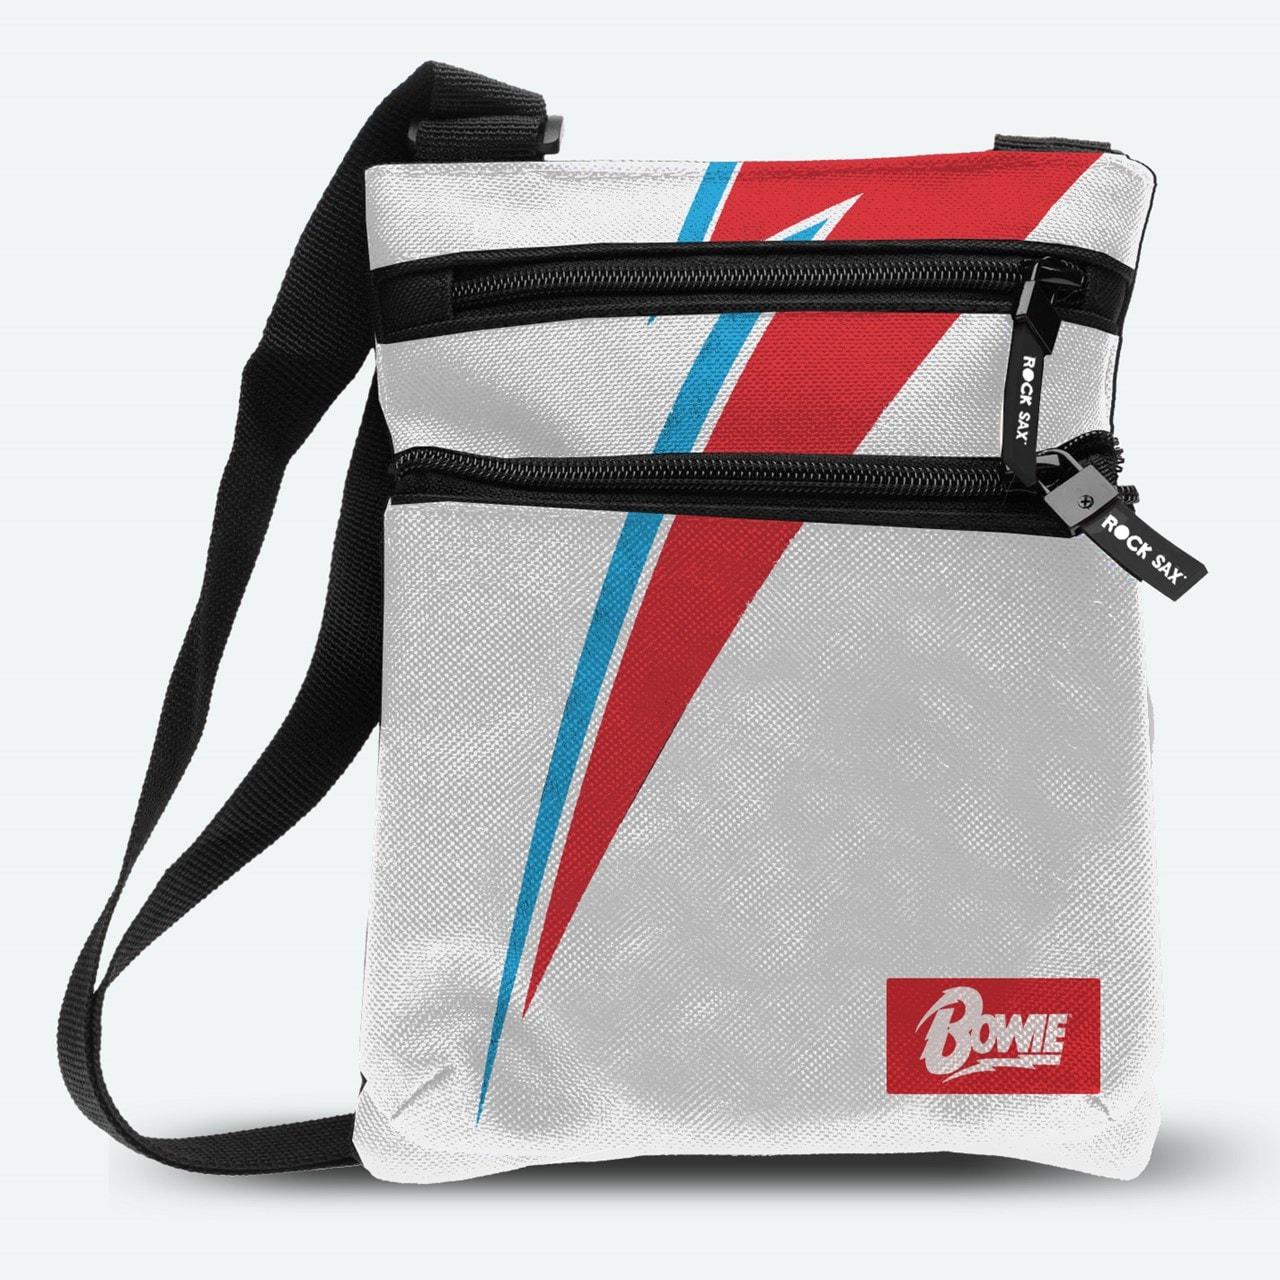 David Bowie: Lightning Body Bag - 1